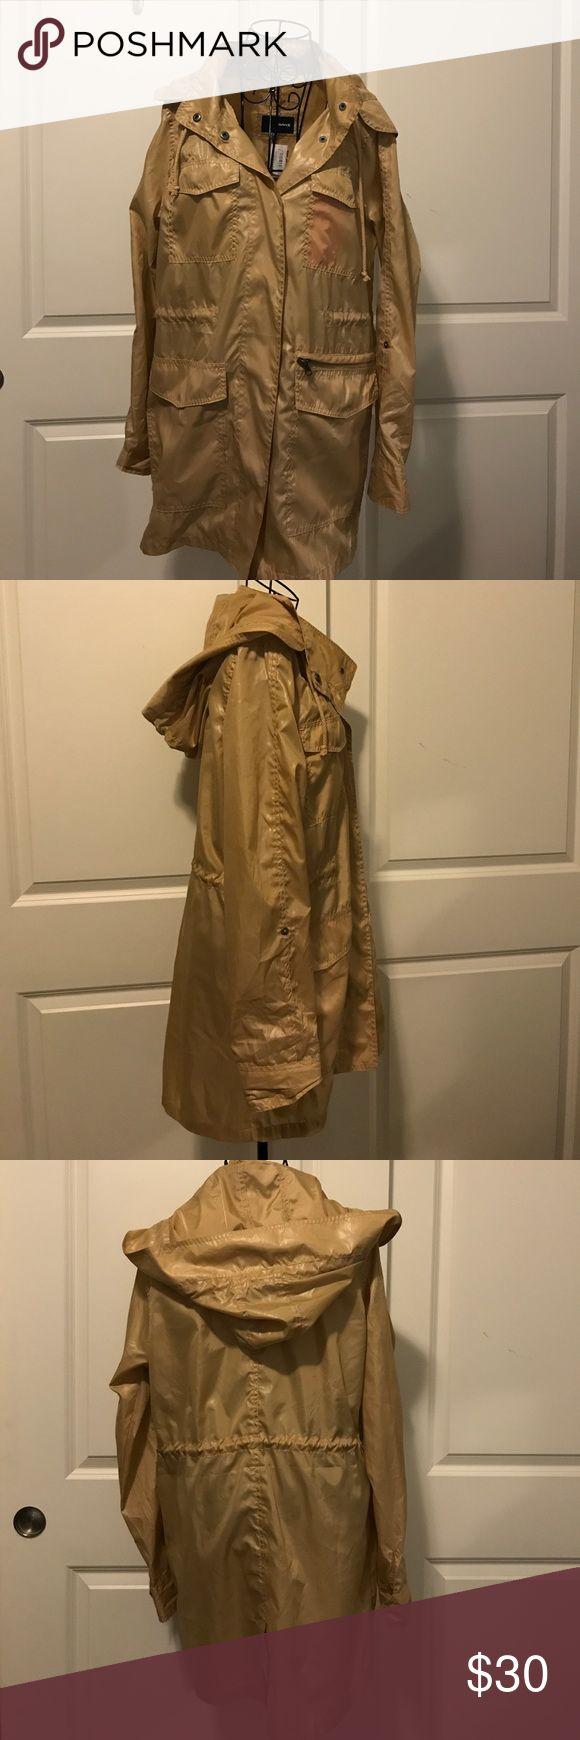 Hurley Gold Rain Jacket Hurley Gold Rain Jacket Hurley Jackets & Coats